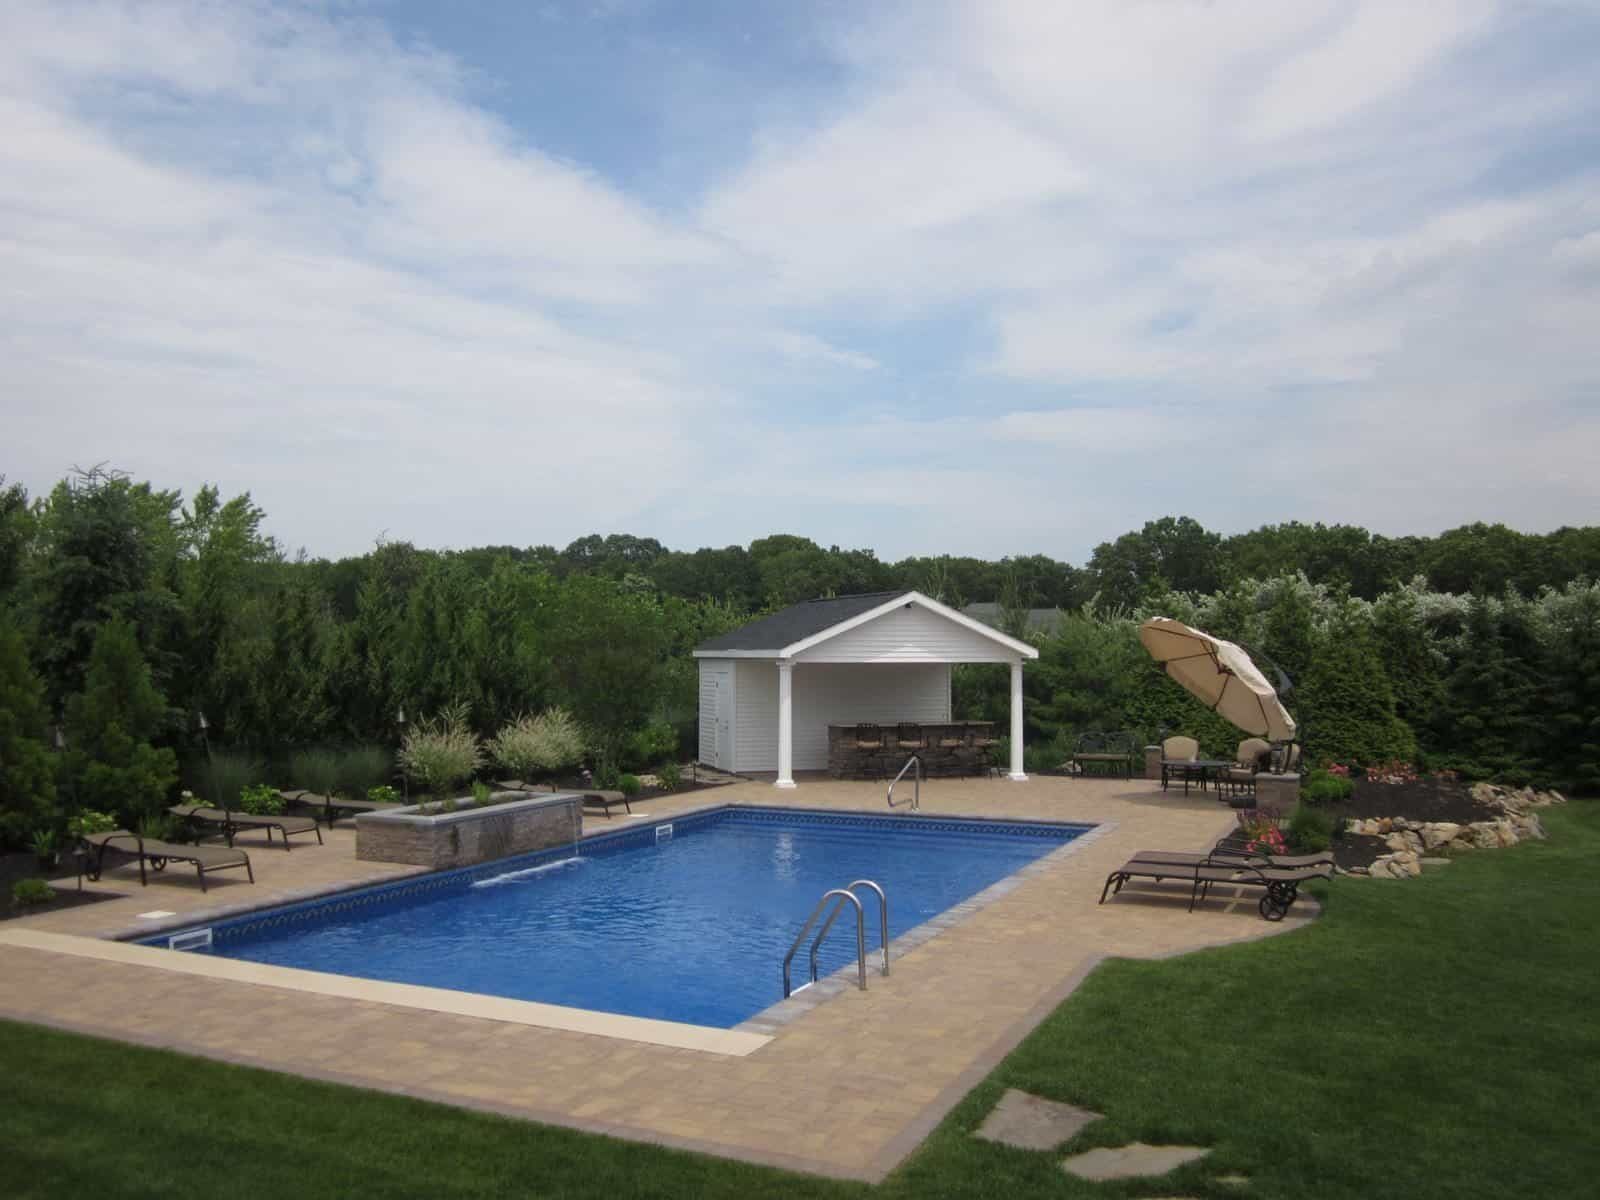 Cabanas & Pool Houses Long Island